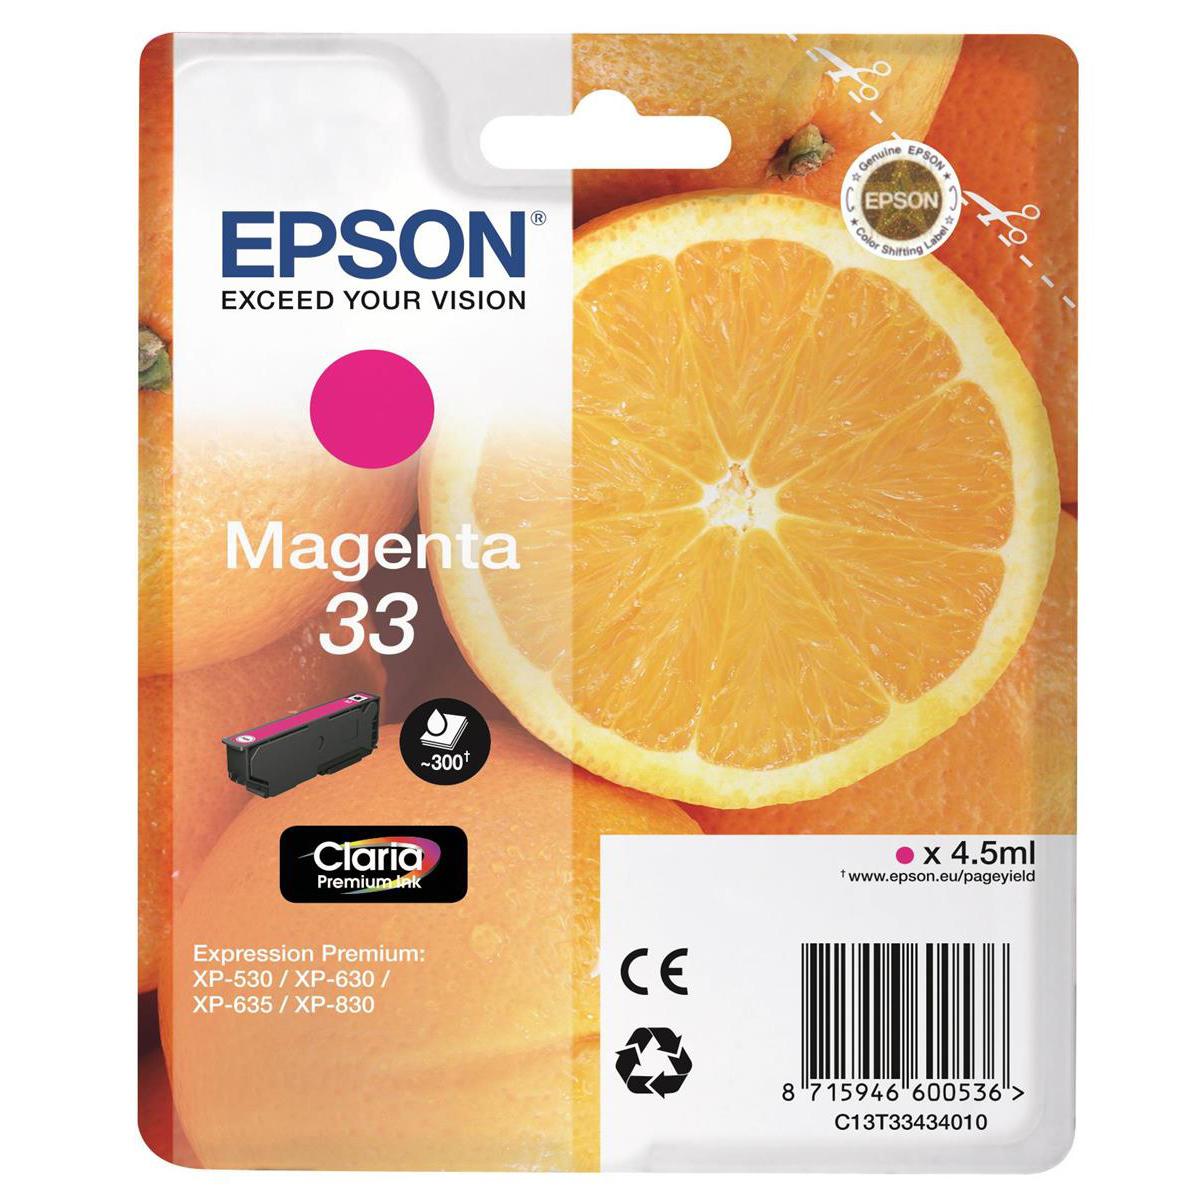 Epson T33 Inkjet Cartridge Orange Page Life 300pp 4.5ml Magenta Ref C13T33434012